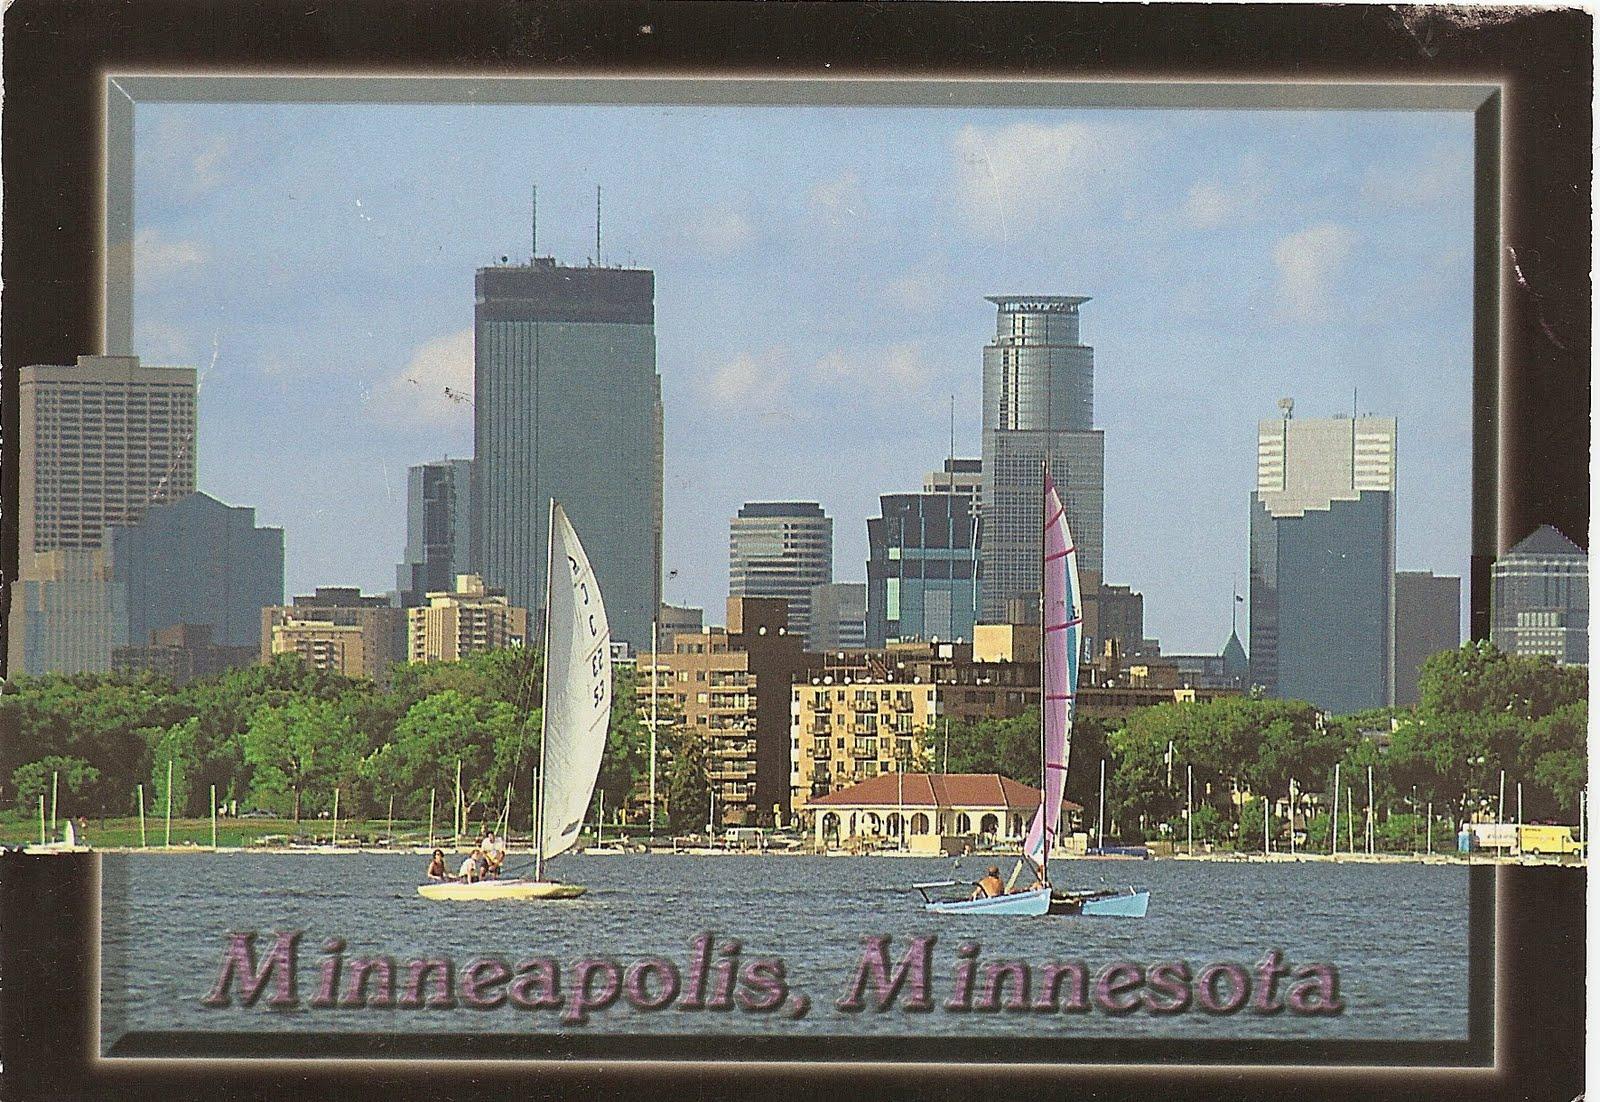 Around the world in postcards 25 usa minneapolis minnesota